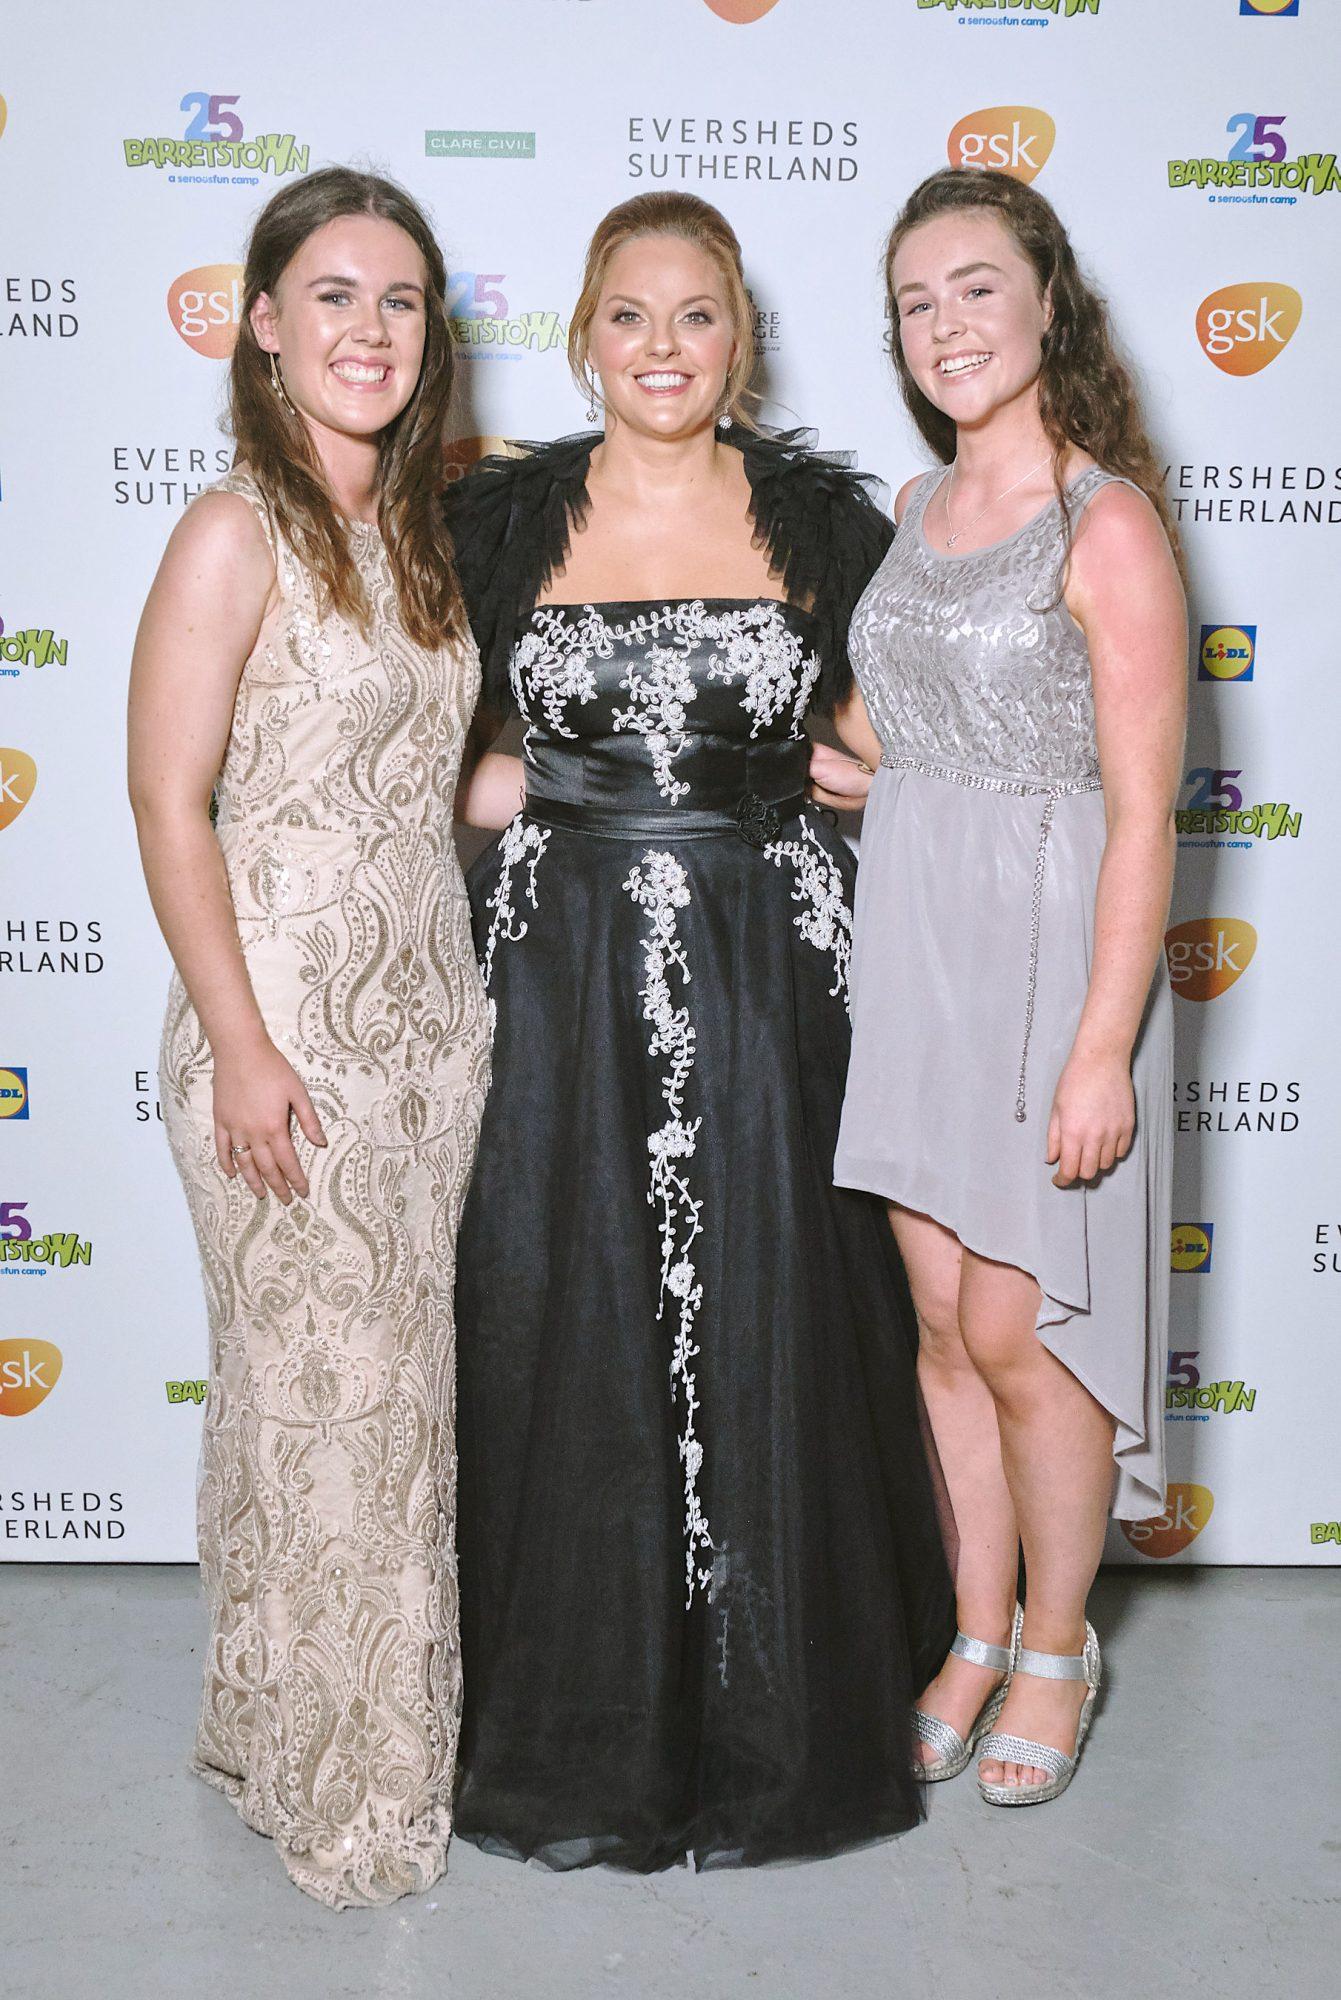 Hannah Byrne, Celine Byrne and Jessica Byrne  at the Barretstown 25th Anniversary Gala Ball at the RDS, Basllsbridge, Dublin.  Pic: Brian McEvoy Photography